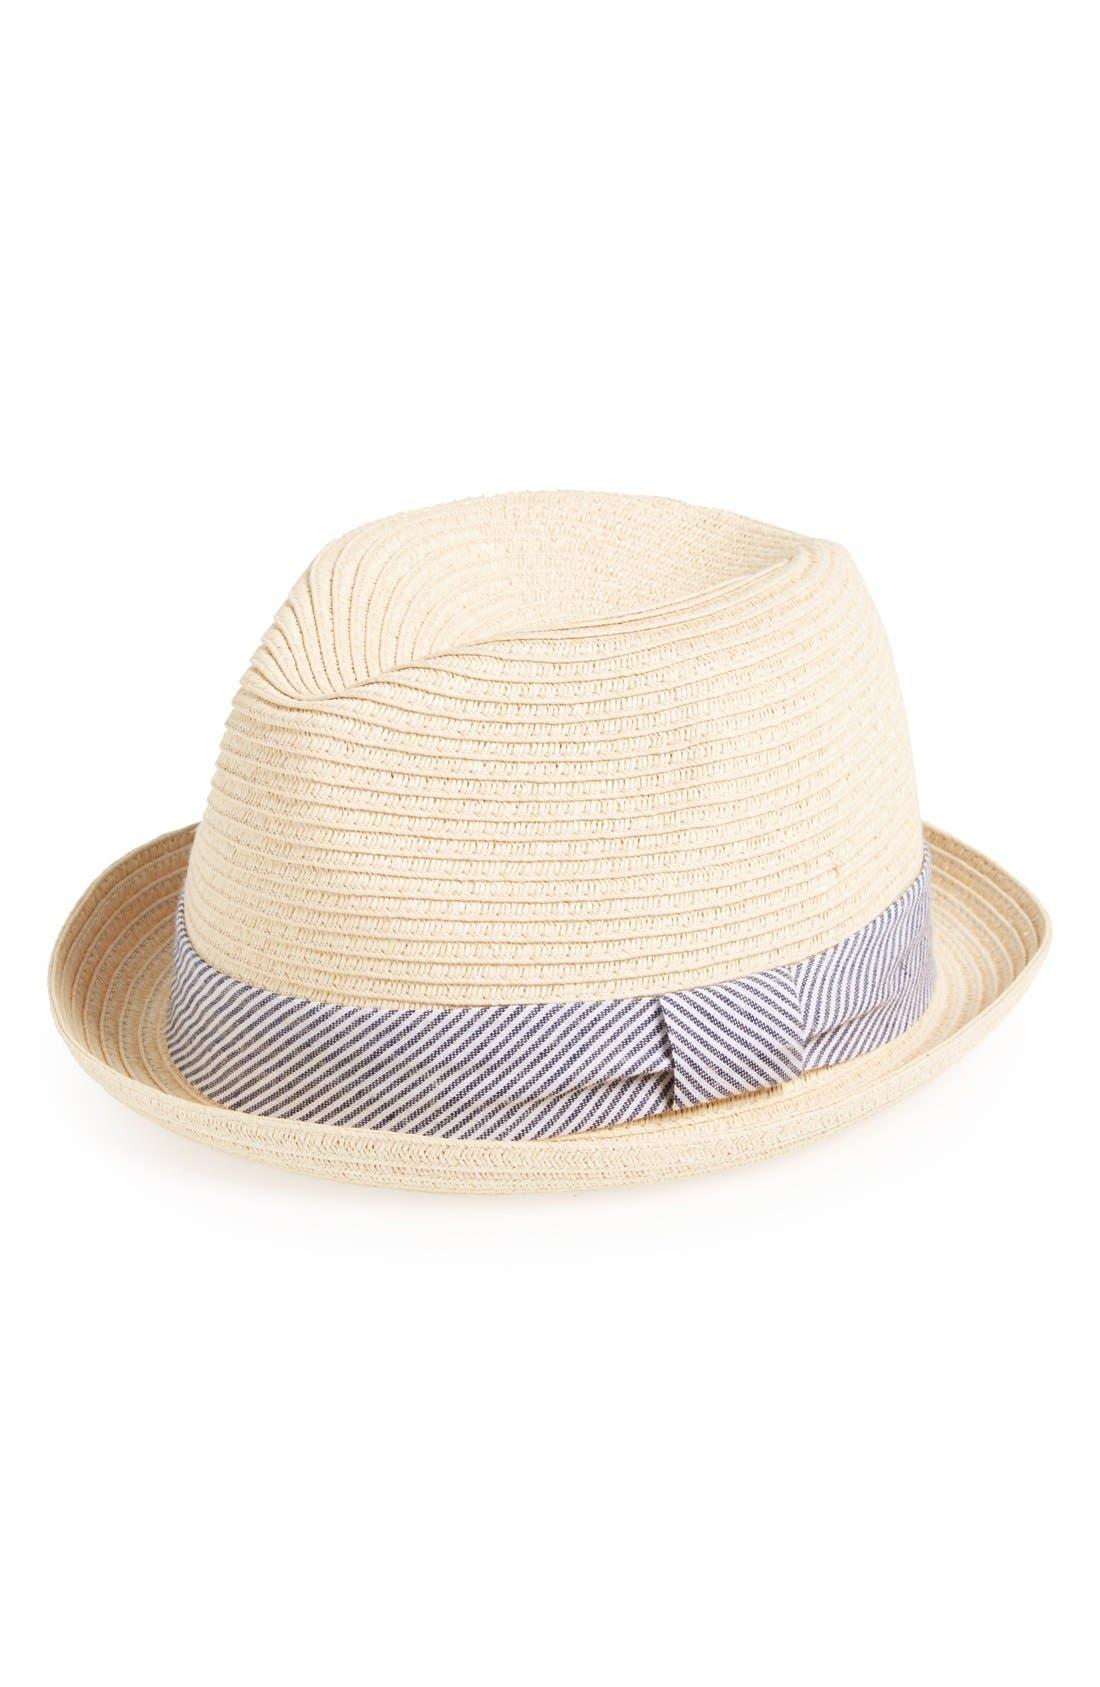 Main Image - Glory Hats by Goorin 'Fireball' Straw Fedora